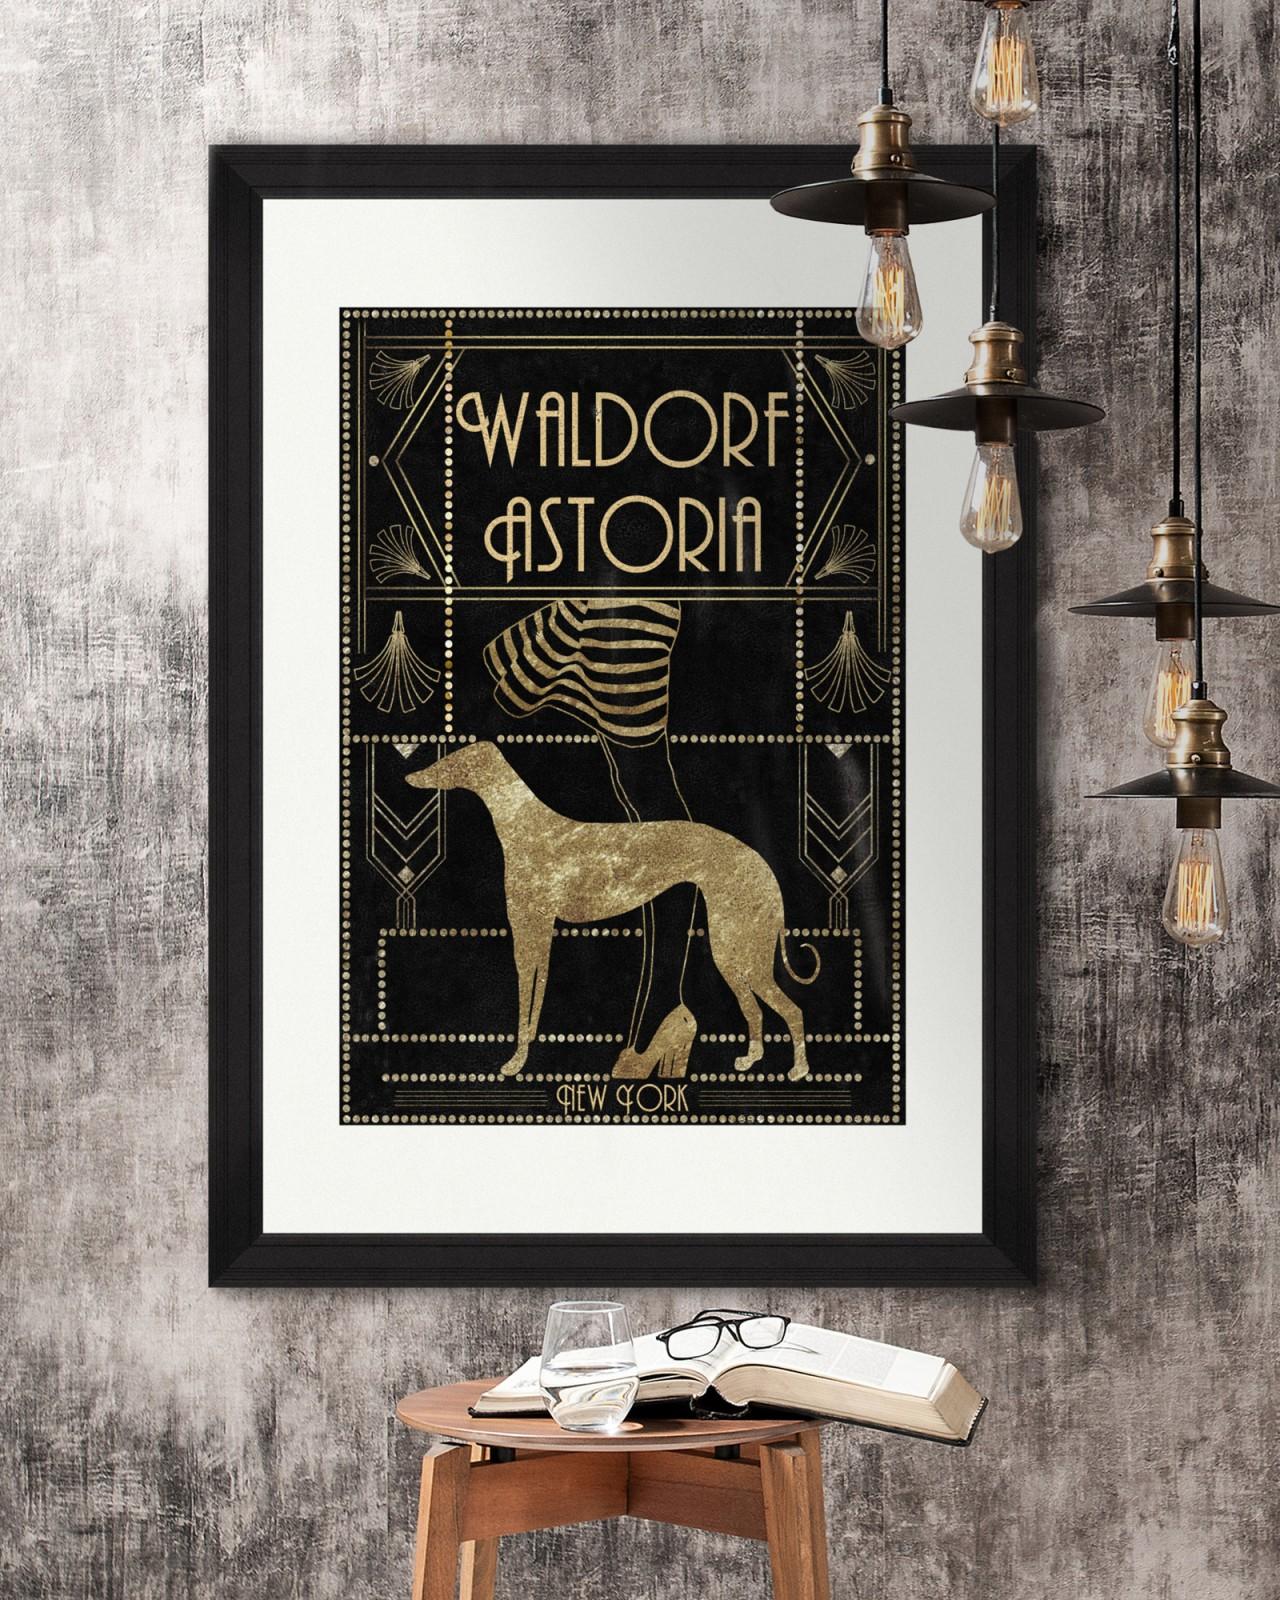 WALDORF ASTORIA Framed Art